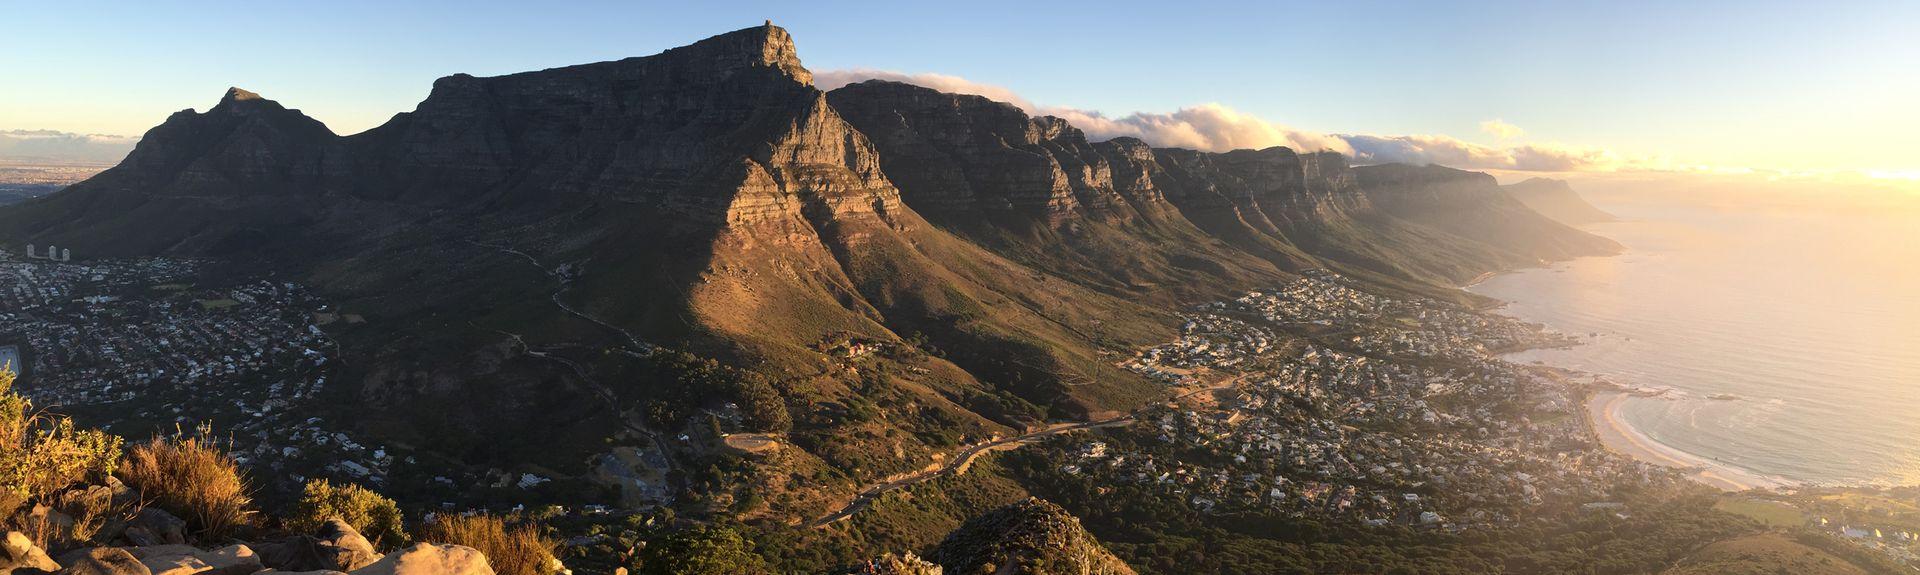 Oranjezicht, Cape Town, South Africa